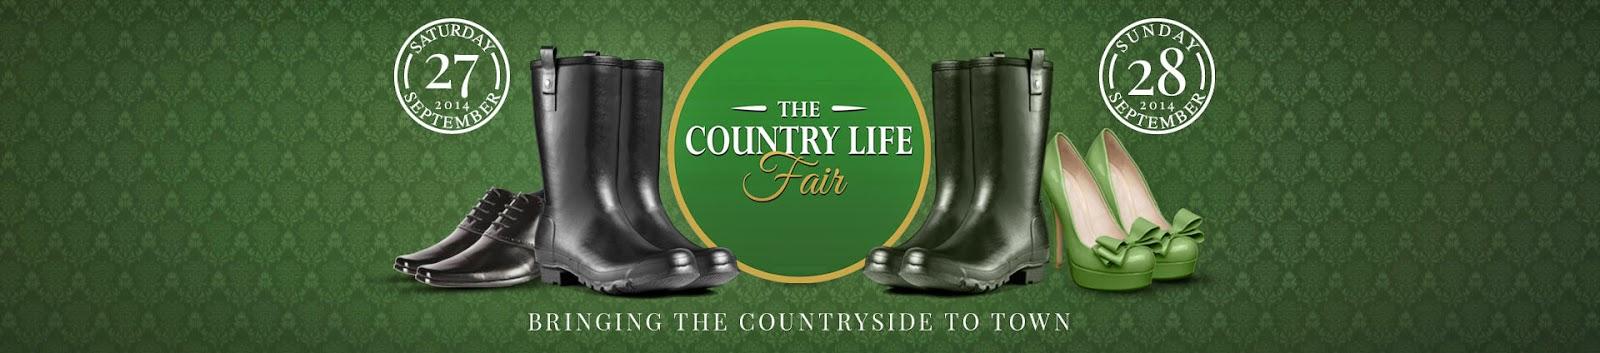 www.countrylifefair.co.uk